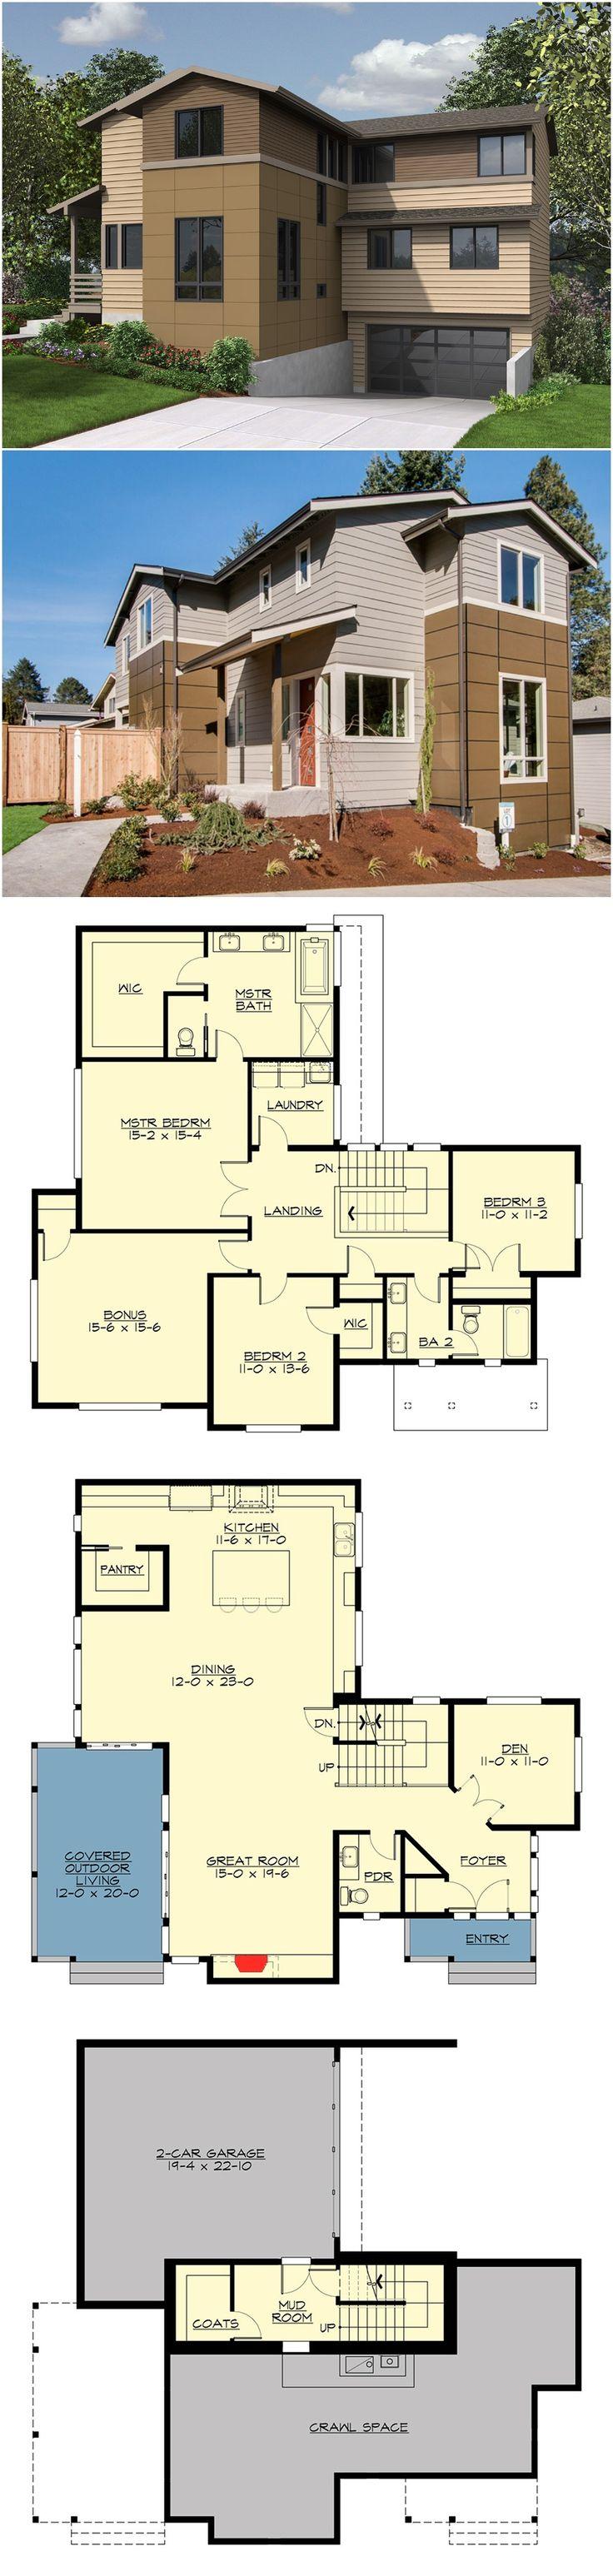 Plan 23634JD Northwest House Plan with Drive Under